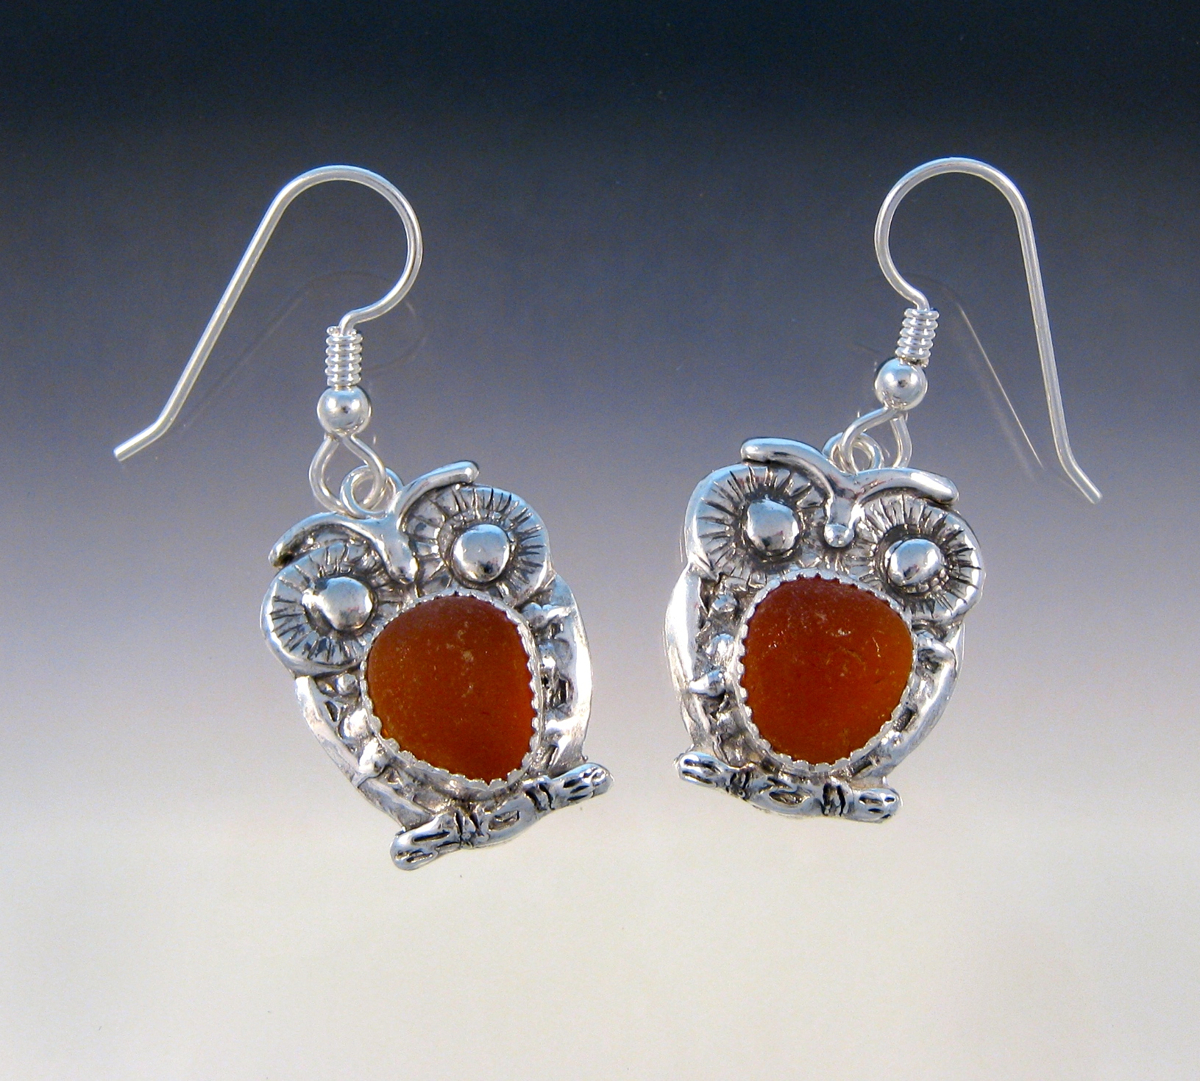 Owl Earrings (large view)